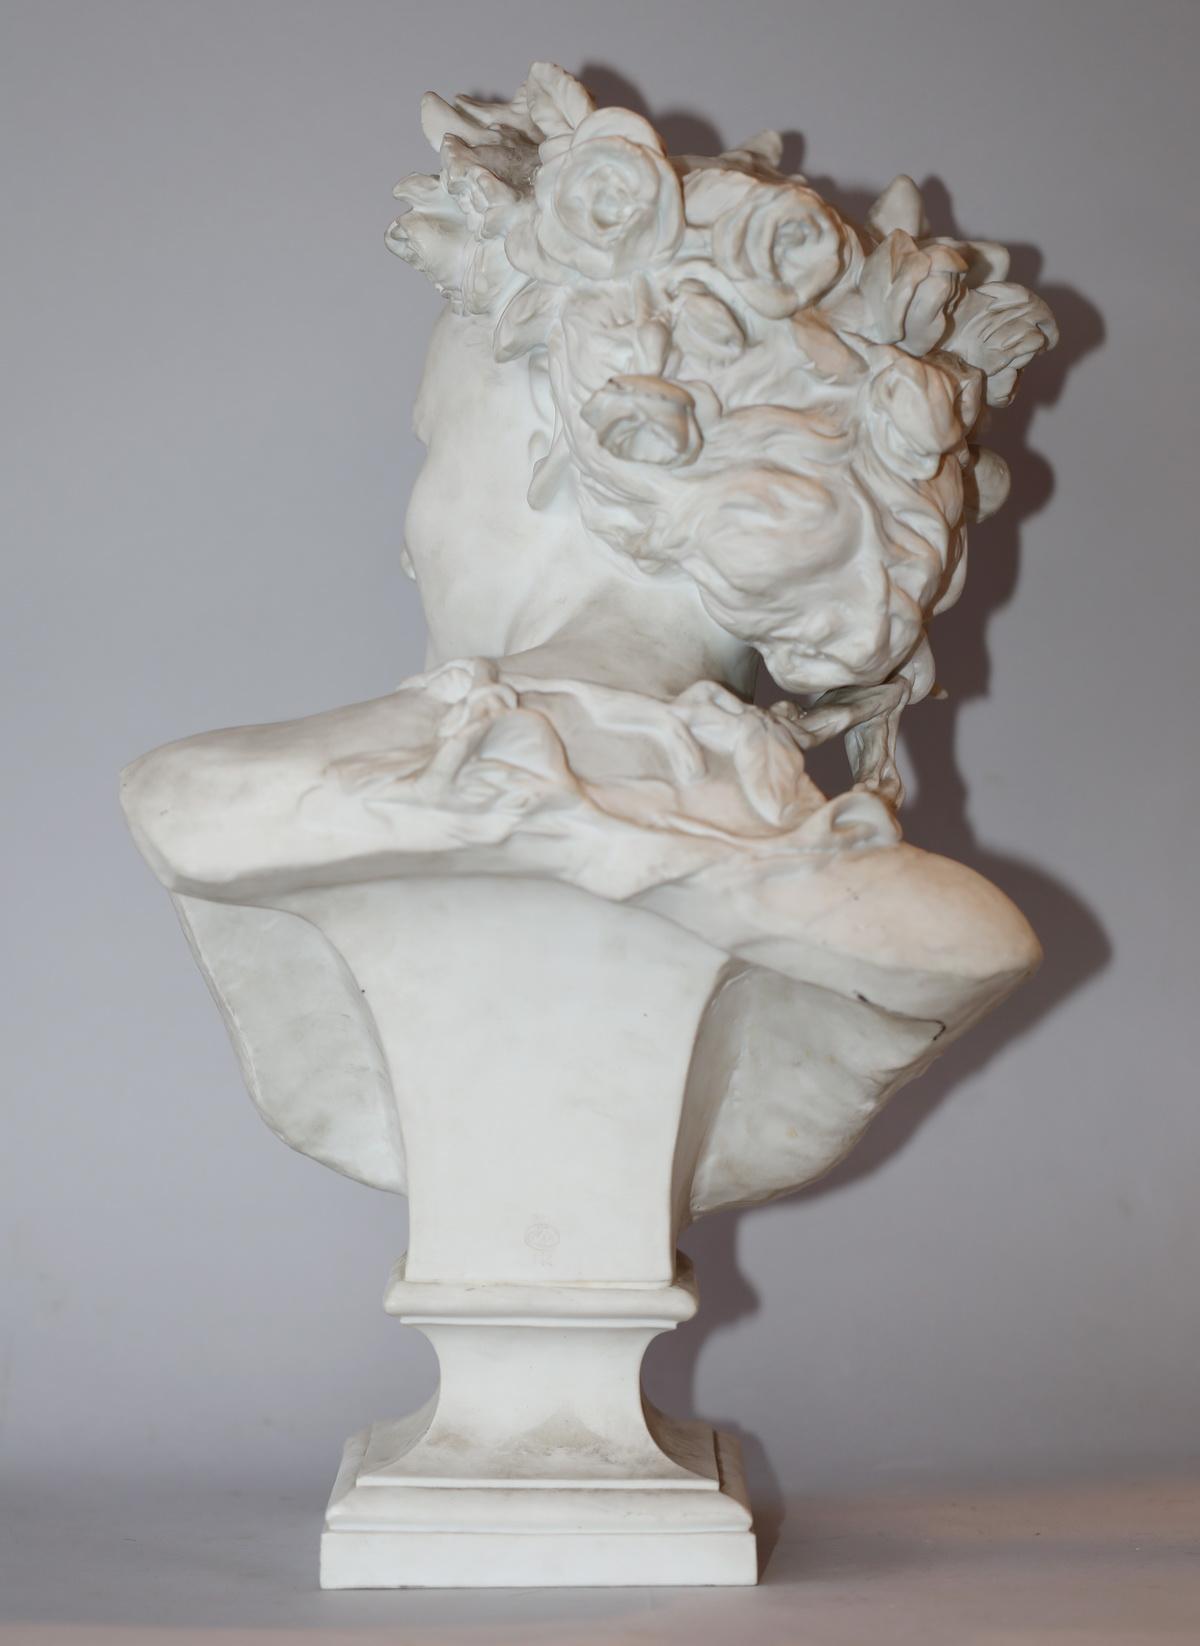 Jean Baptiste CARPEAUX 1827-1875